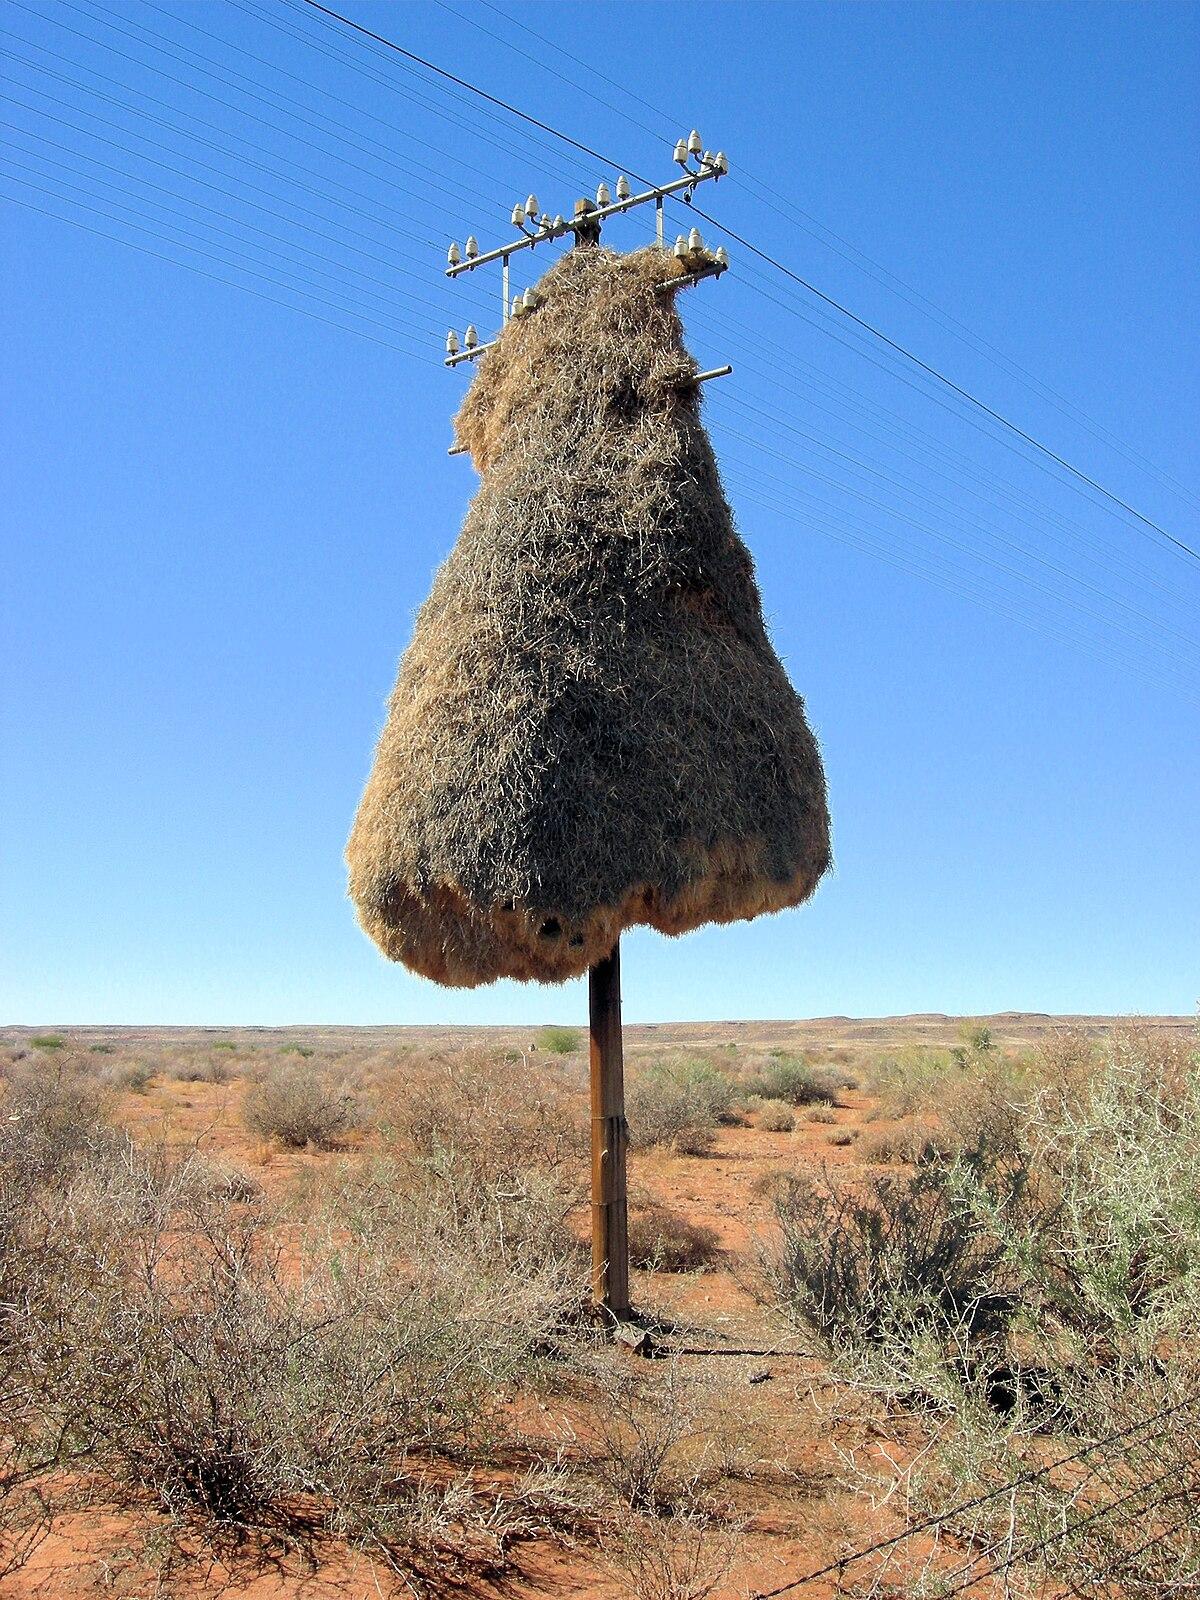 Kgalagadi Transfrontier Park Travel Guide At Wikivoyage